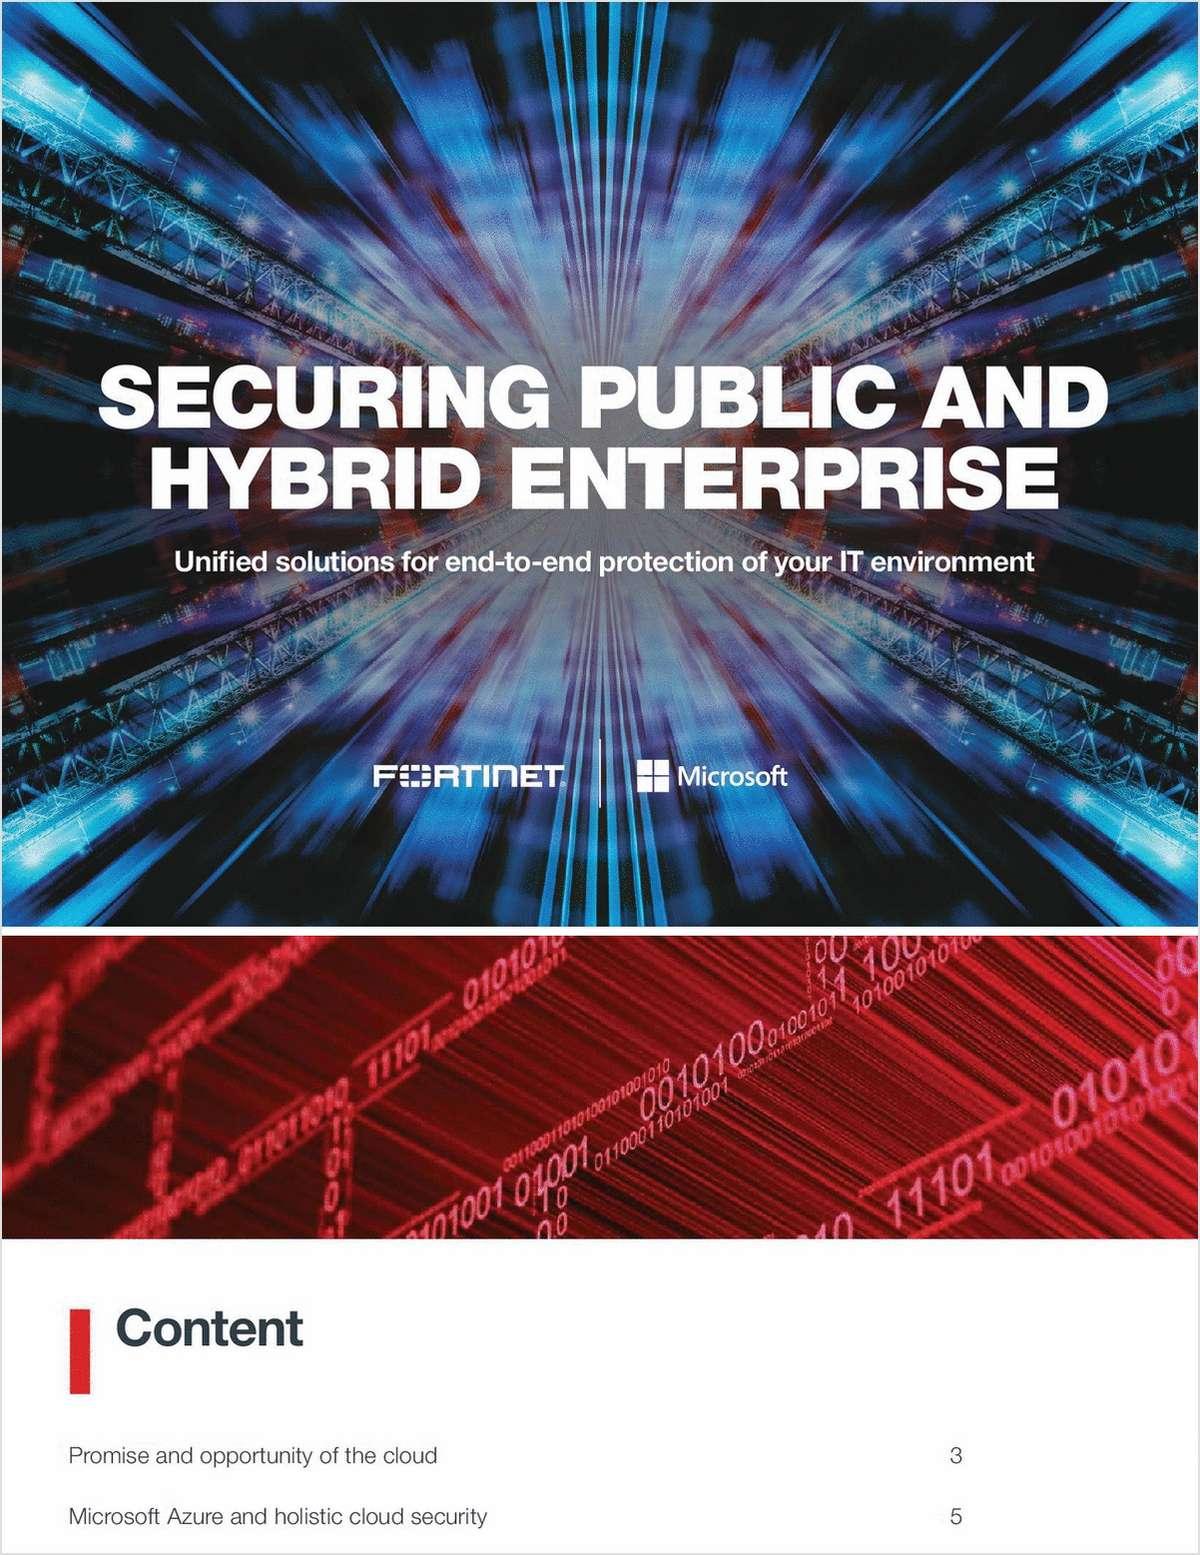 Securing Public and Hybrid Enterprises